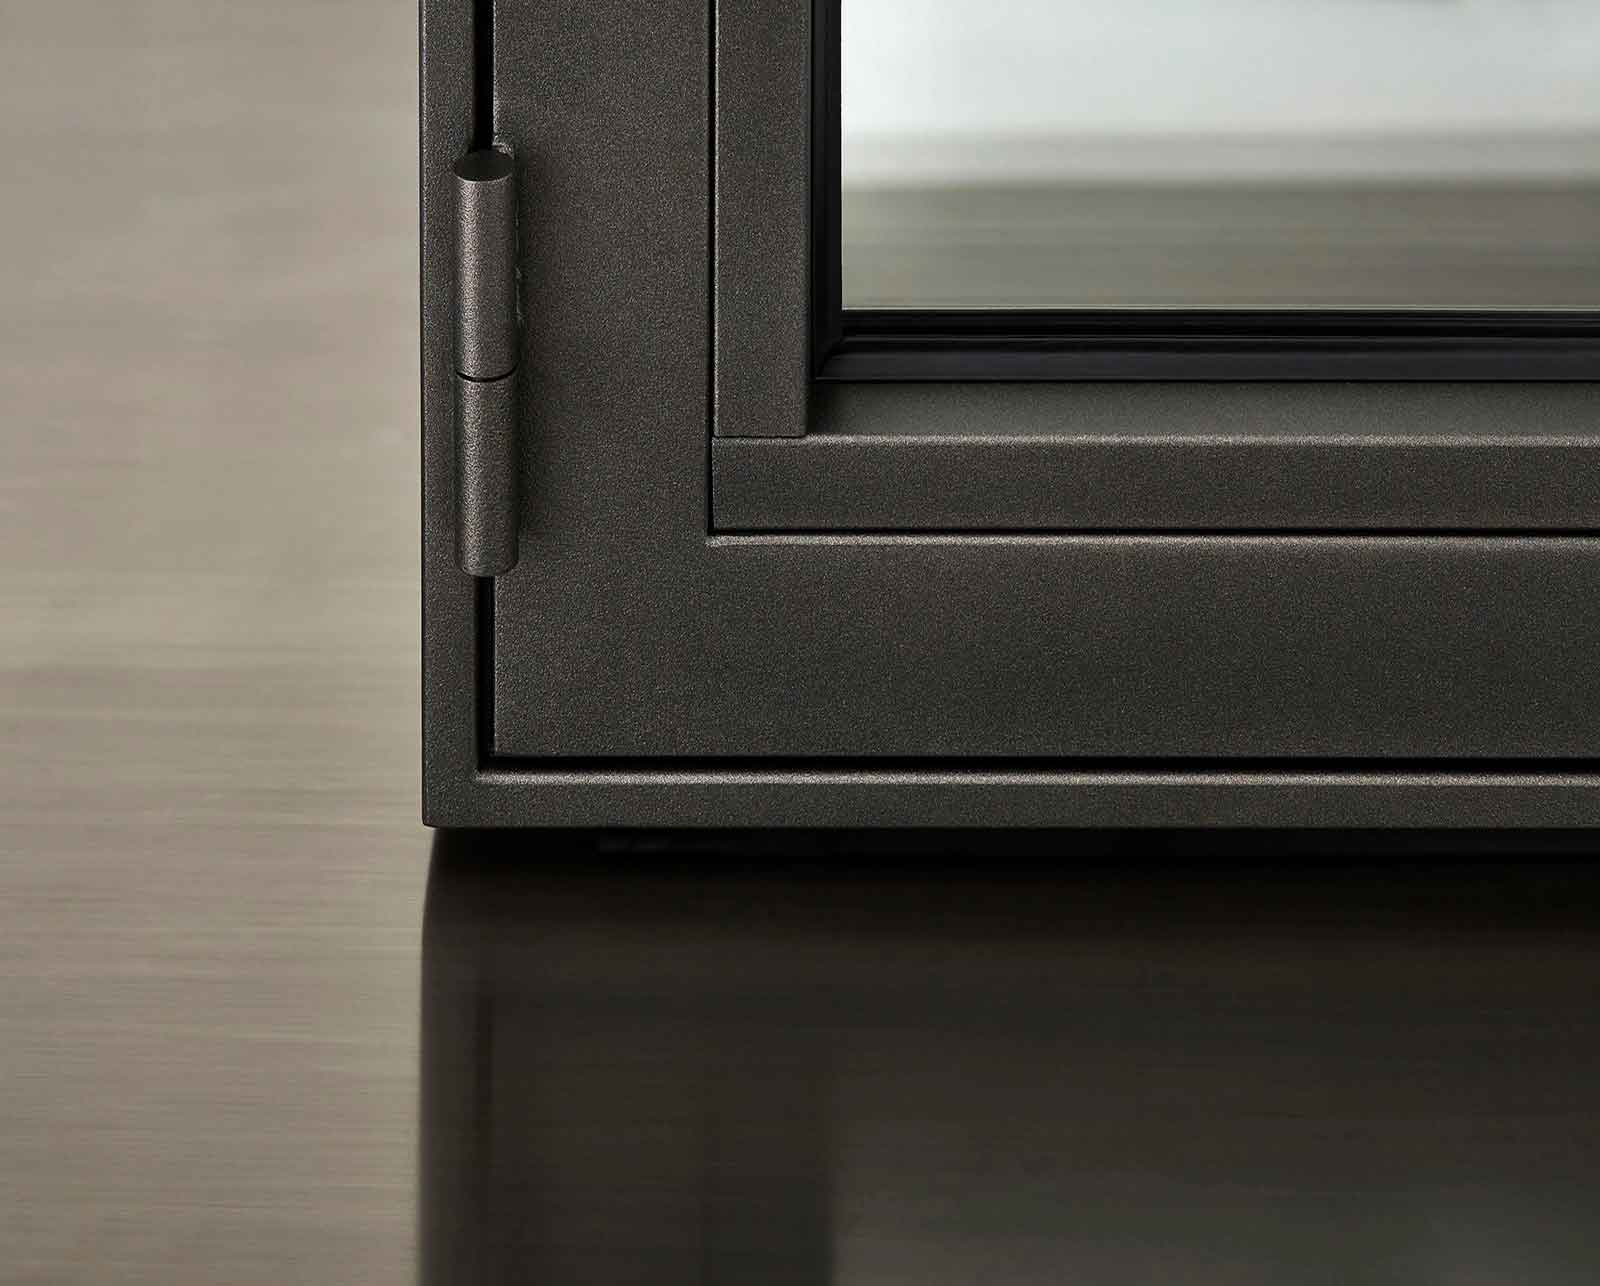 درب-و-پنجره-یو-پی-وی-سی-رنگی-آماج-صنعت-رنگی-106